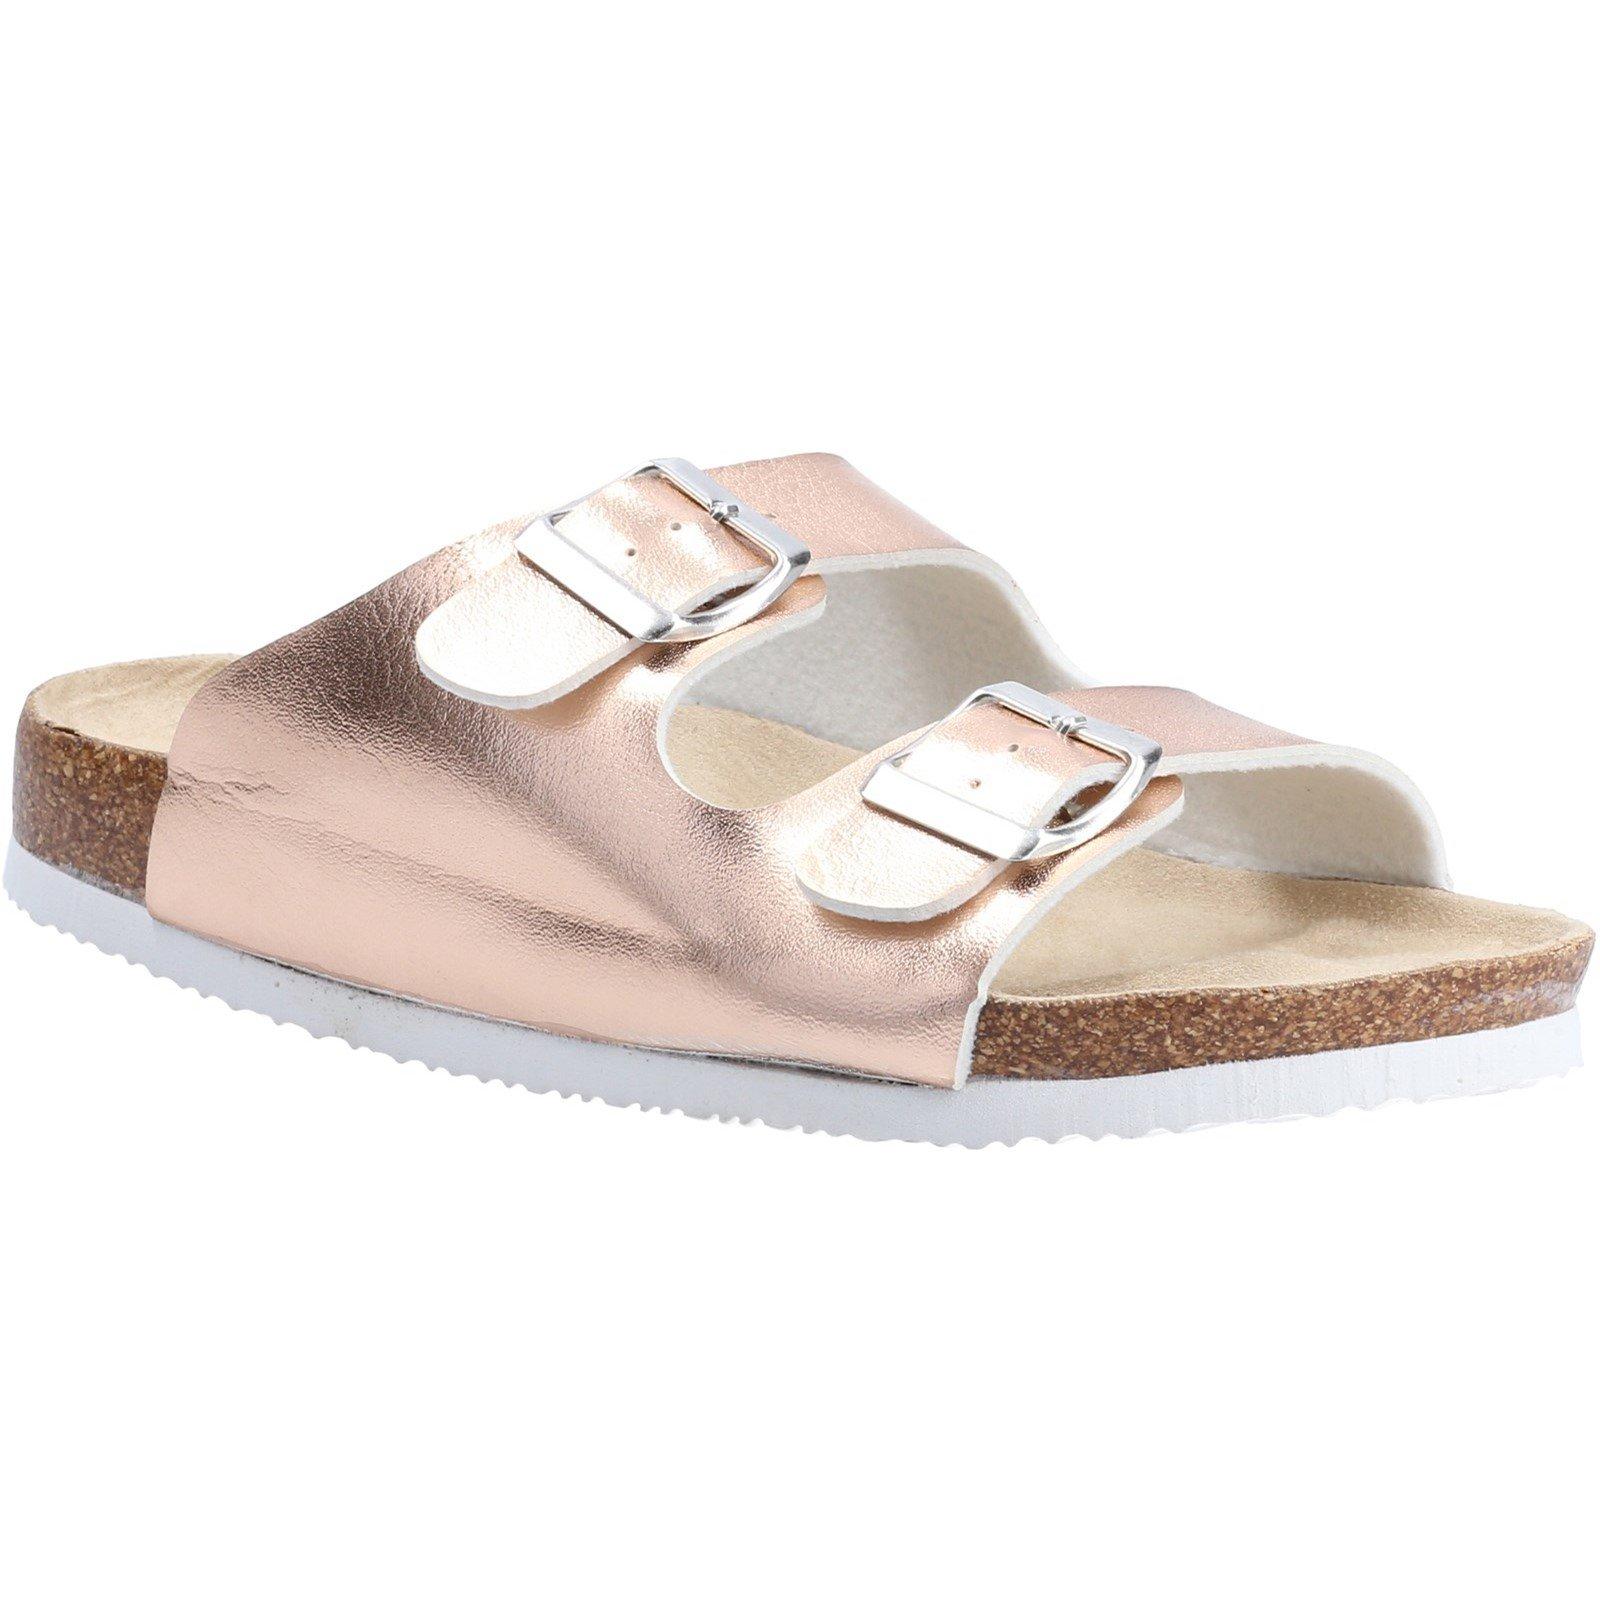 Divaz Women's Nimes Two Buckle Sandal Various Colours 31920 - Rose Gold 3